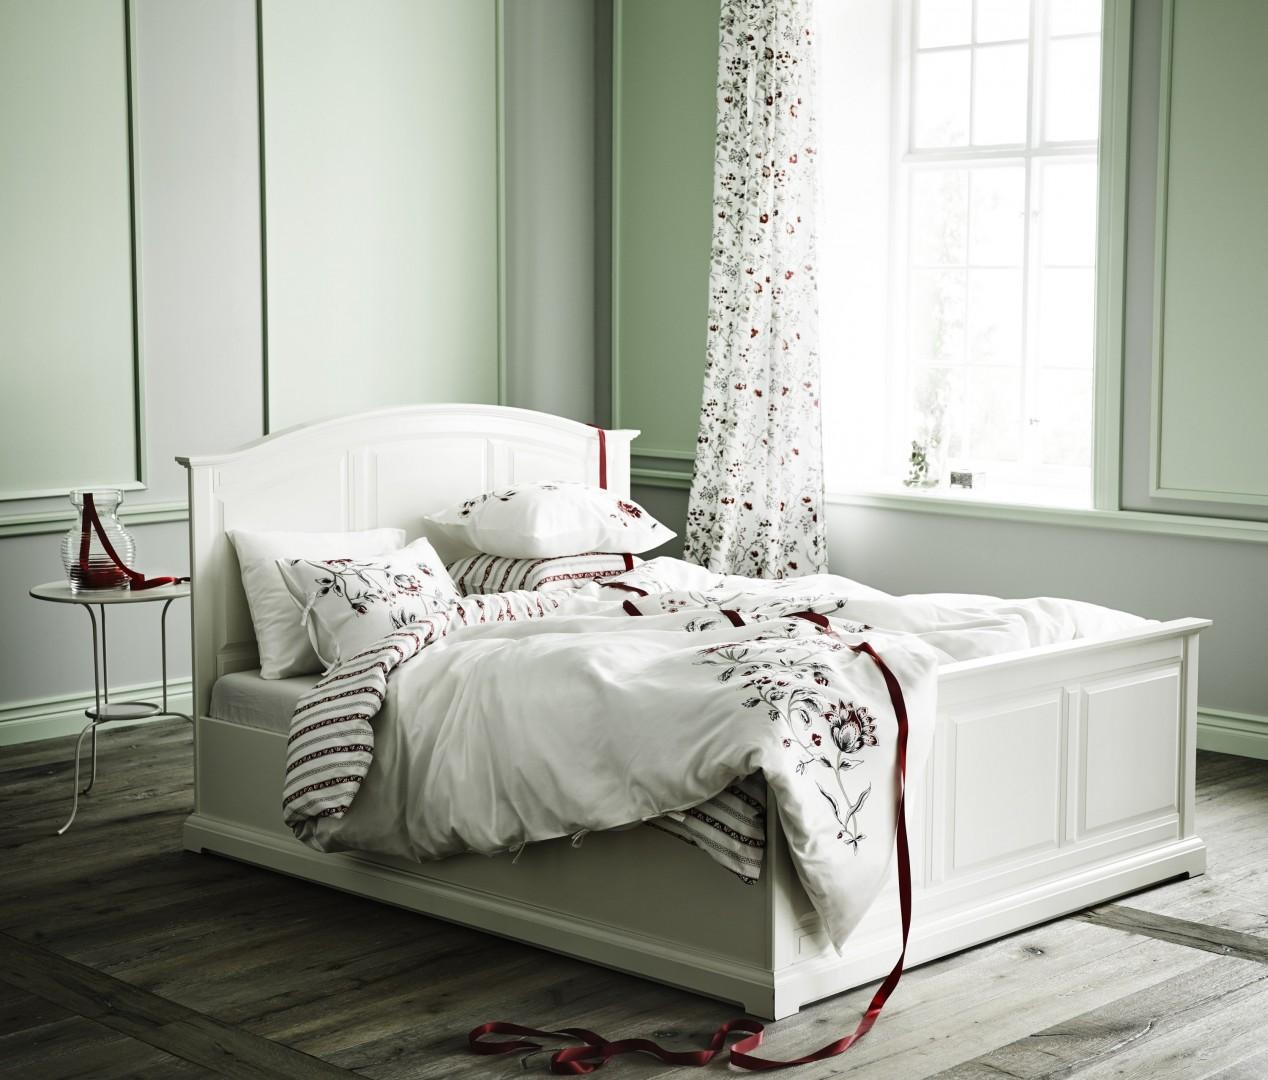 Katalog Mebli Birkeland łóżko Skąpane W Bieli Meble